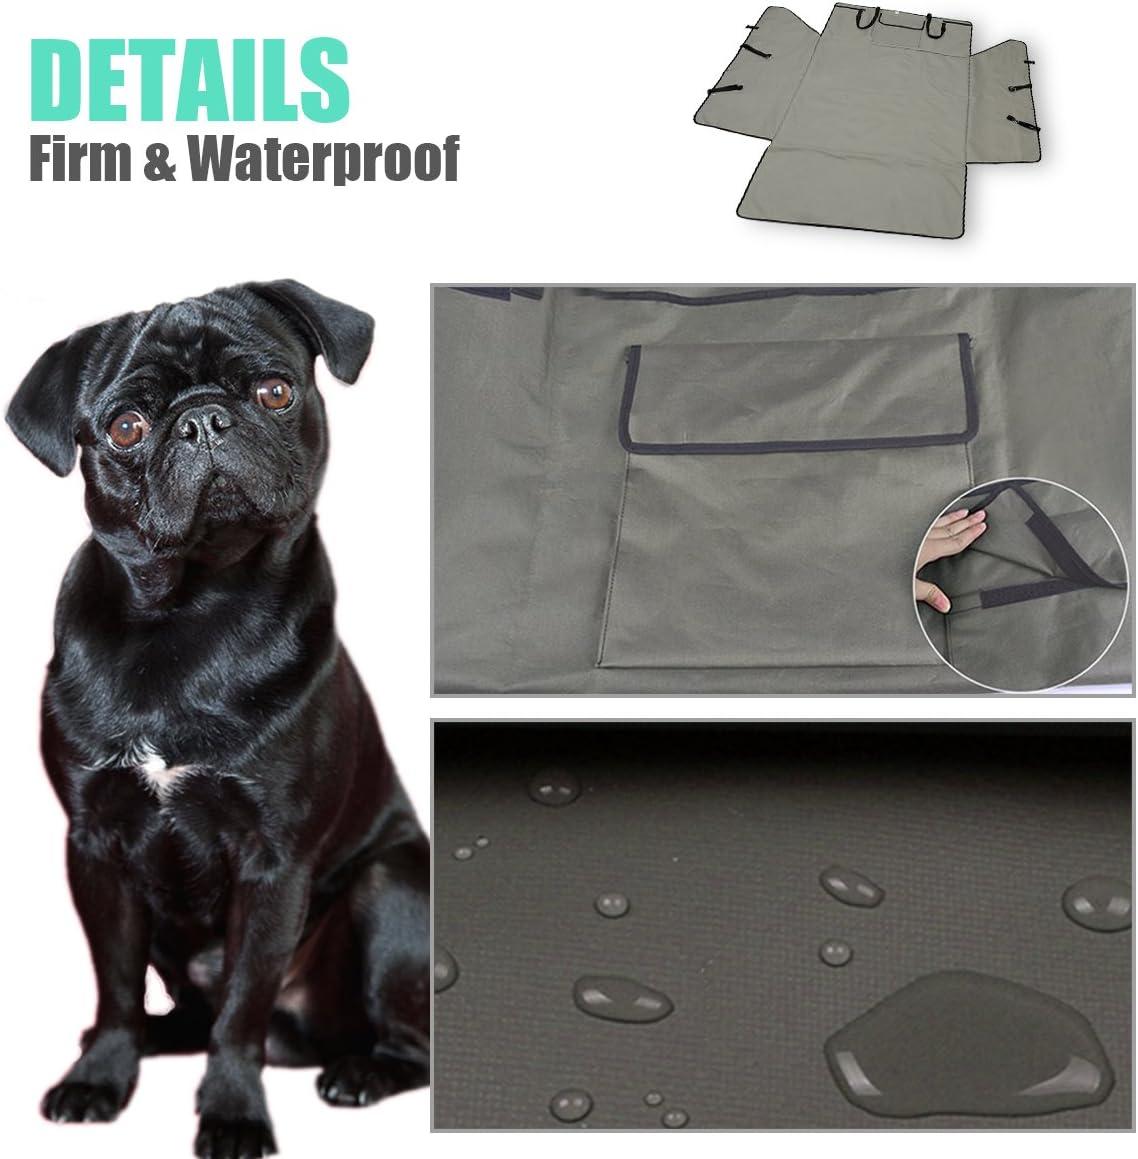 PETCUTE Funda Maletero Perros Protector Maletero Cubre Maletero para Perros Funda Coche Perro Protector Maletero de Coche para Perros